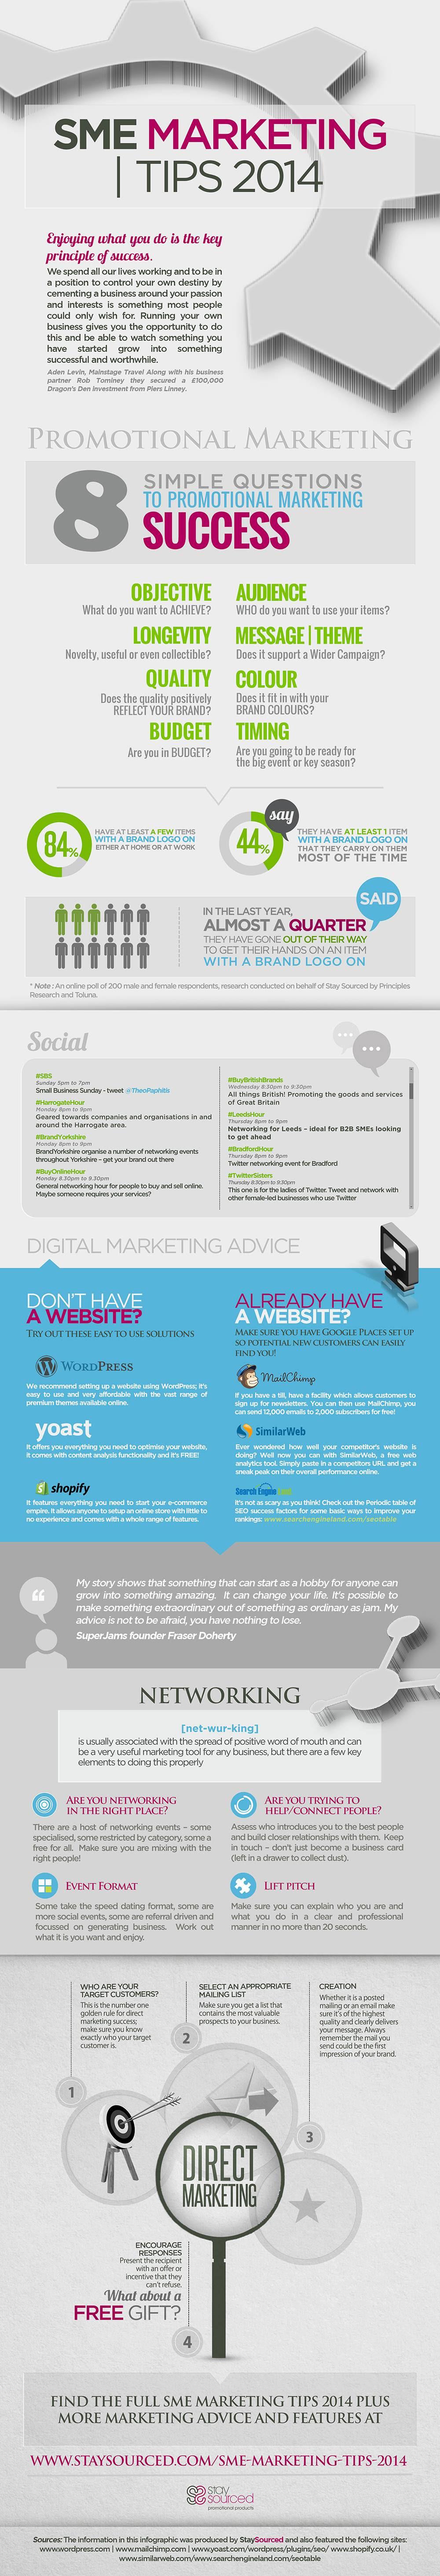 Infographic: SME Marketing Tips 2014